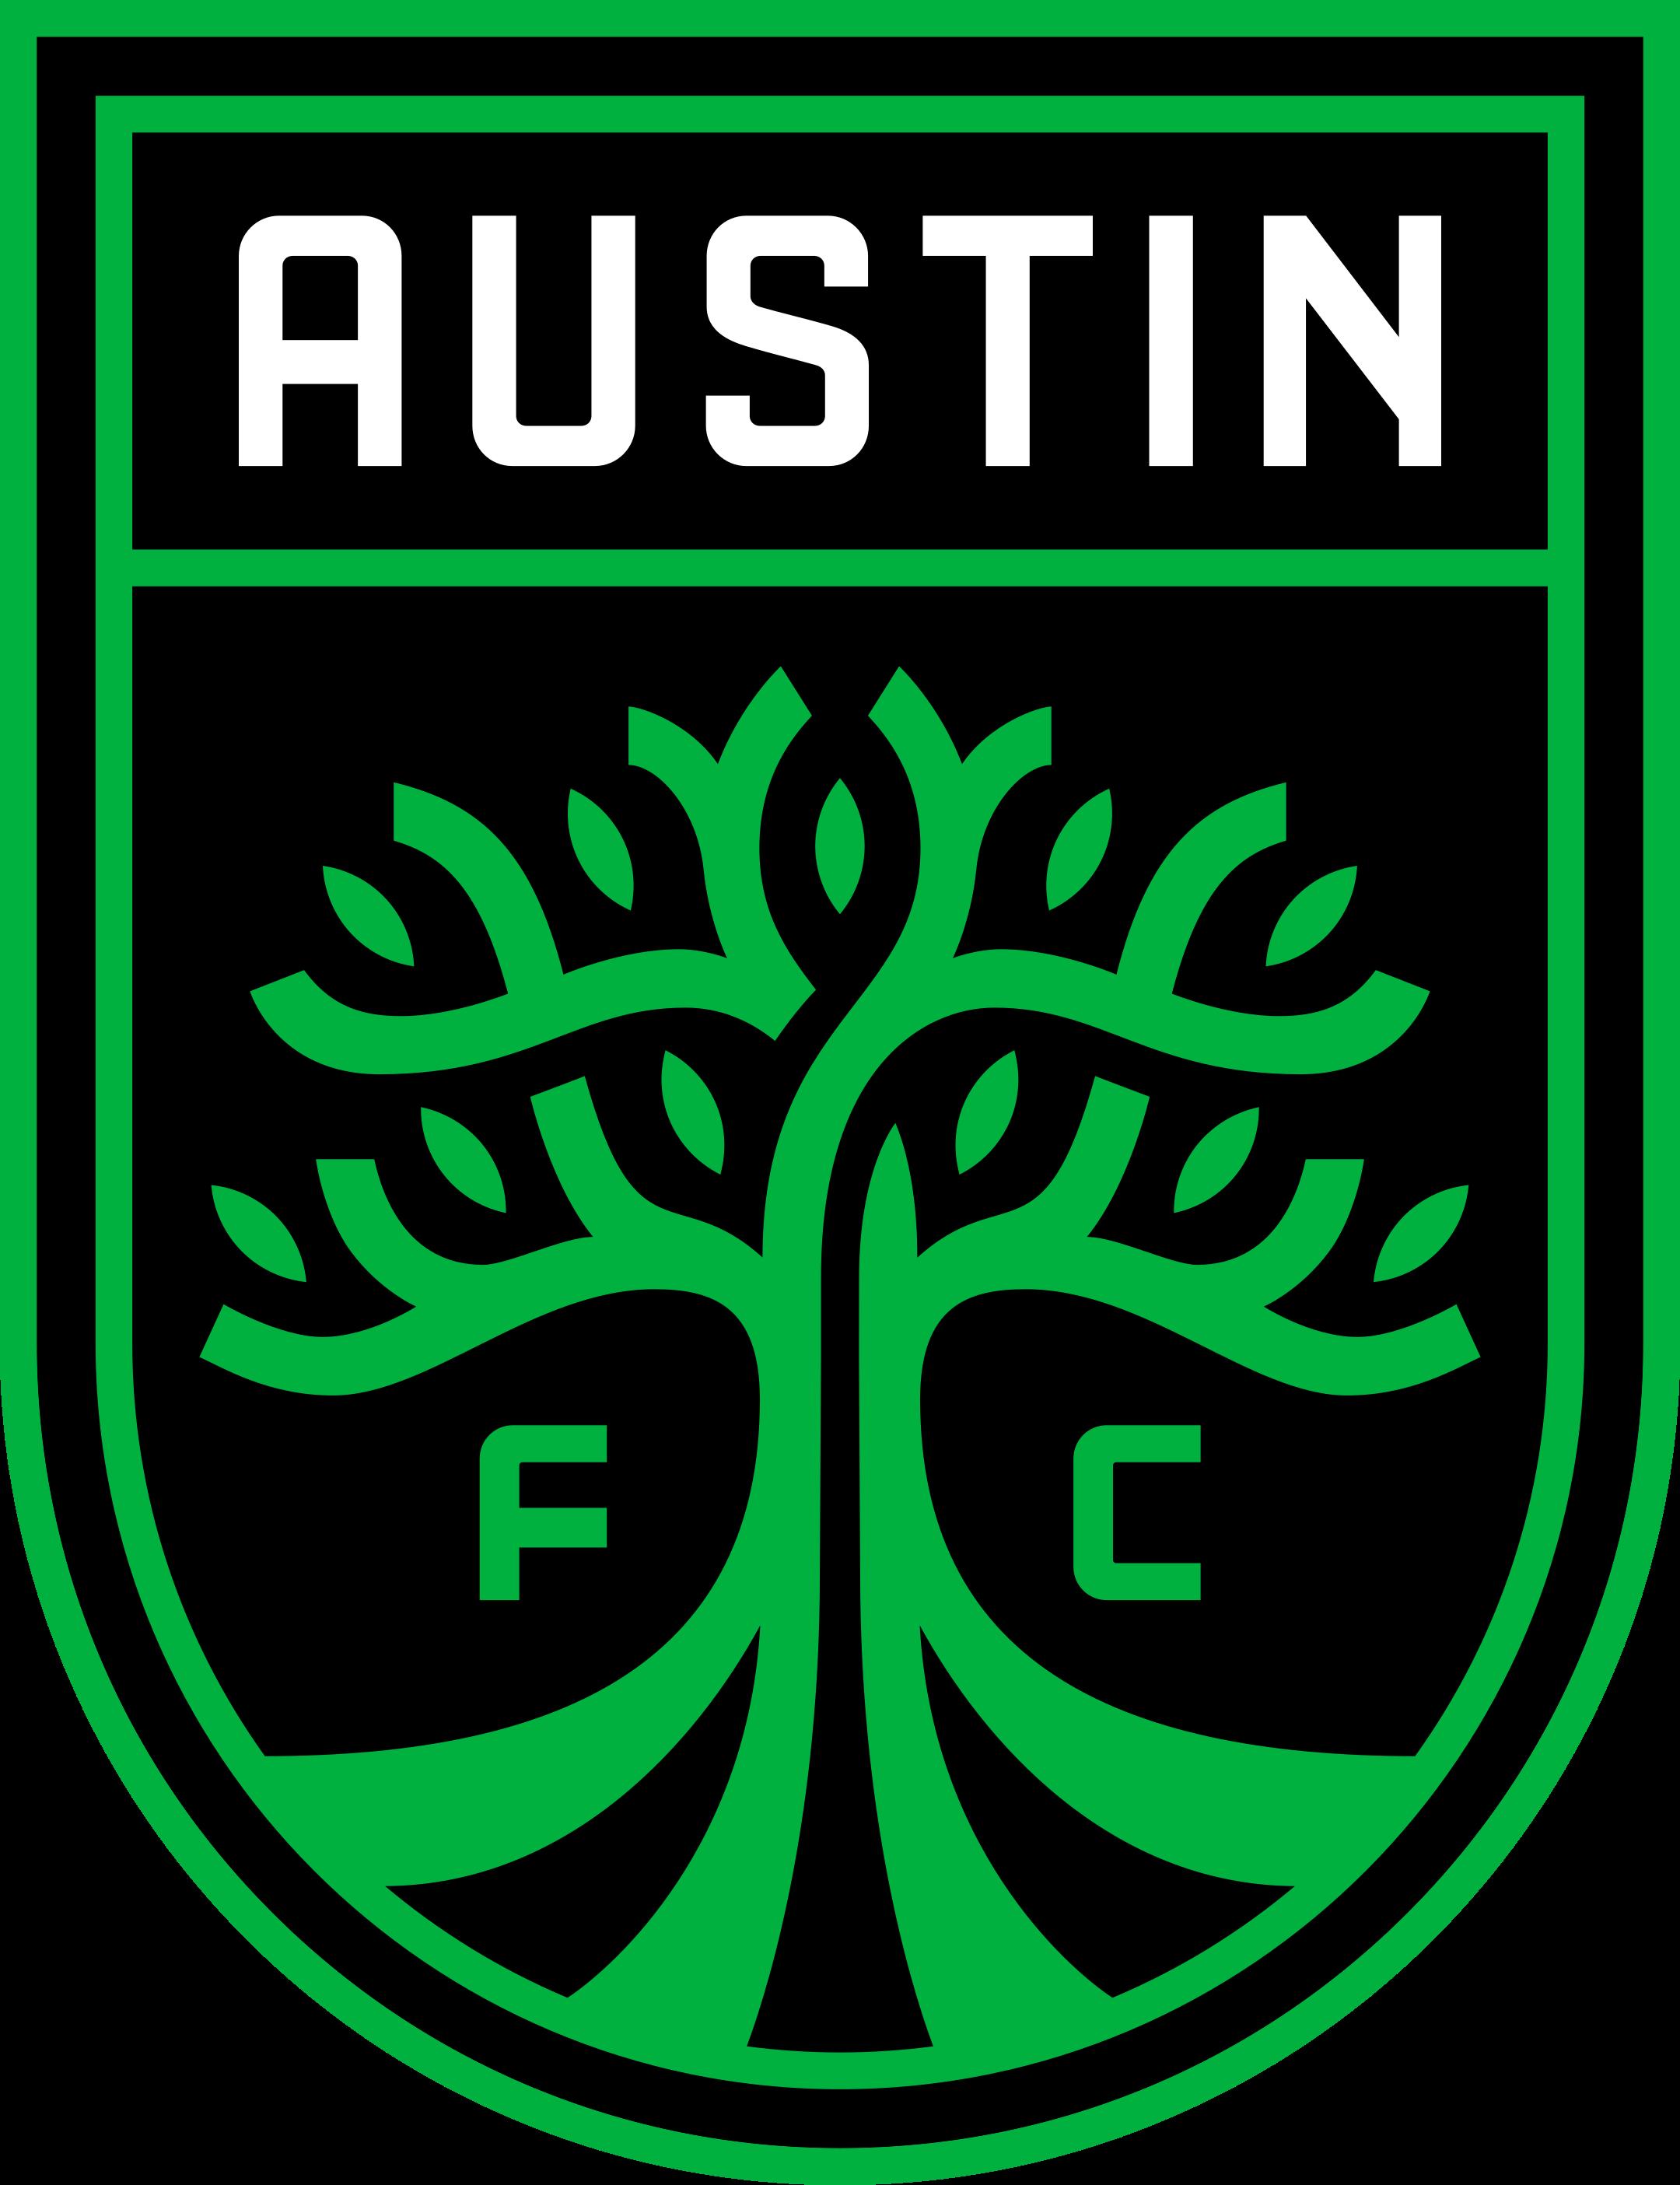 austin fc logo 1 - Austin FC Logo